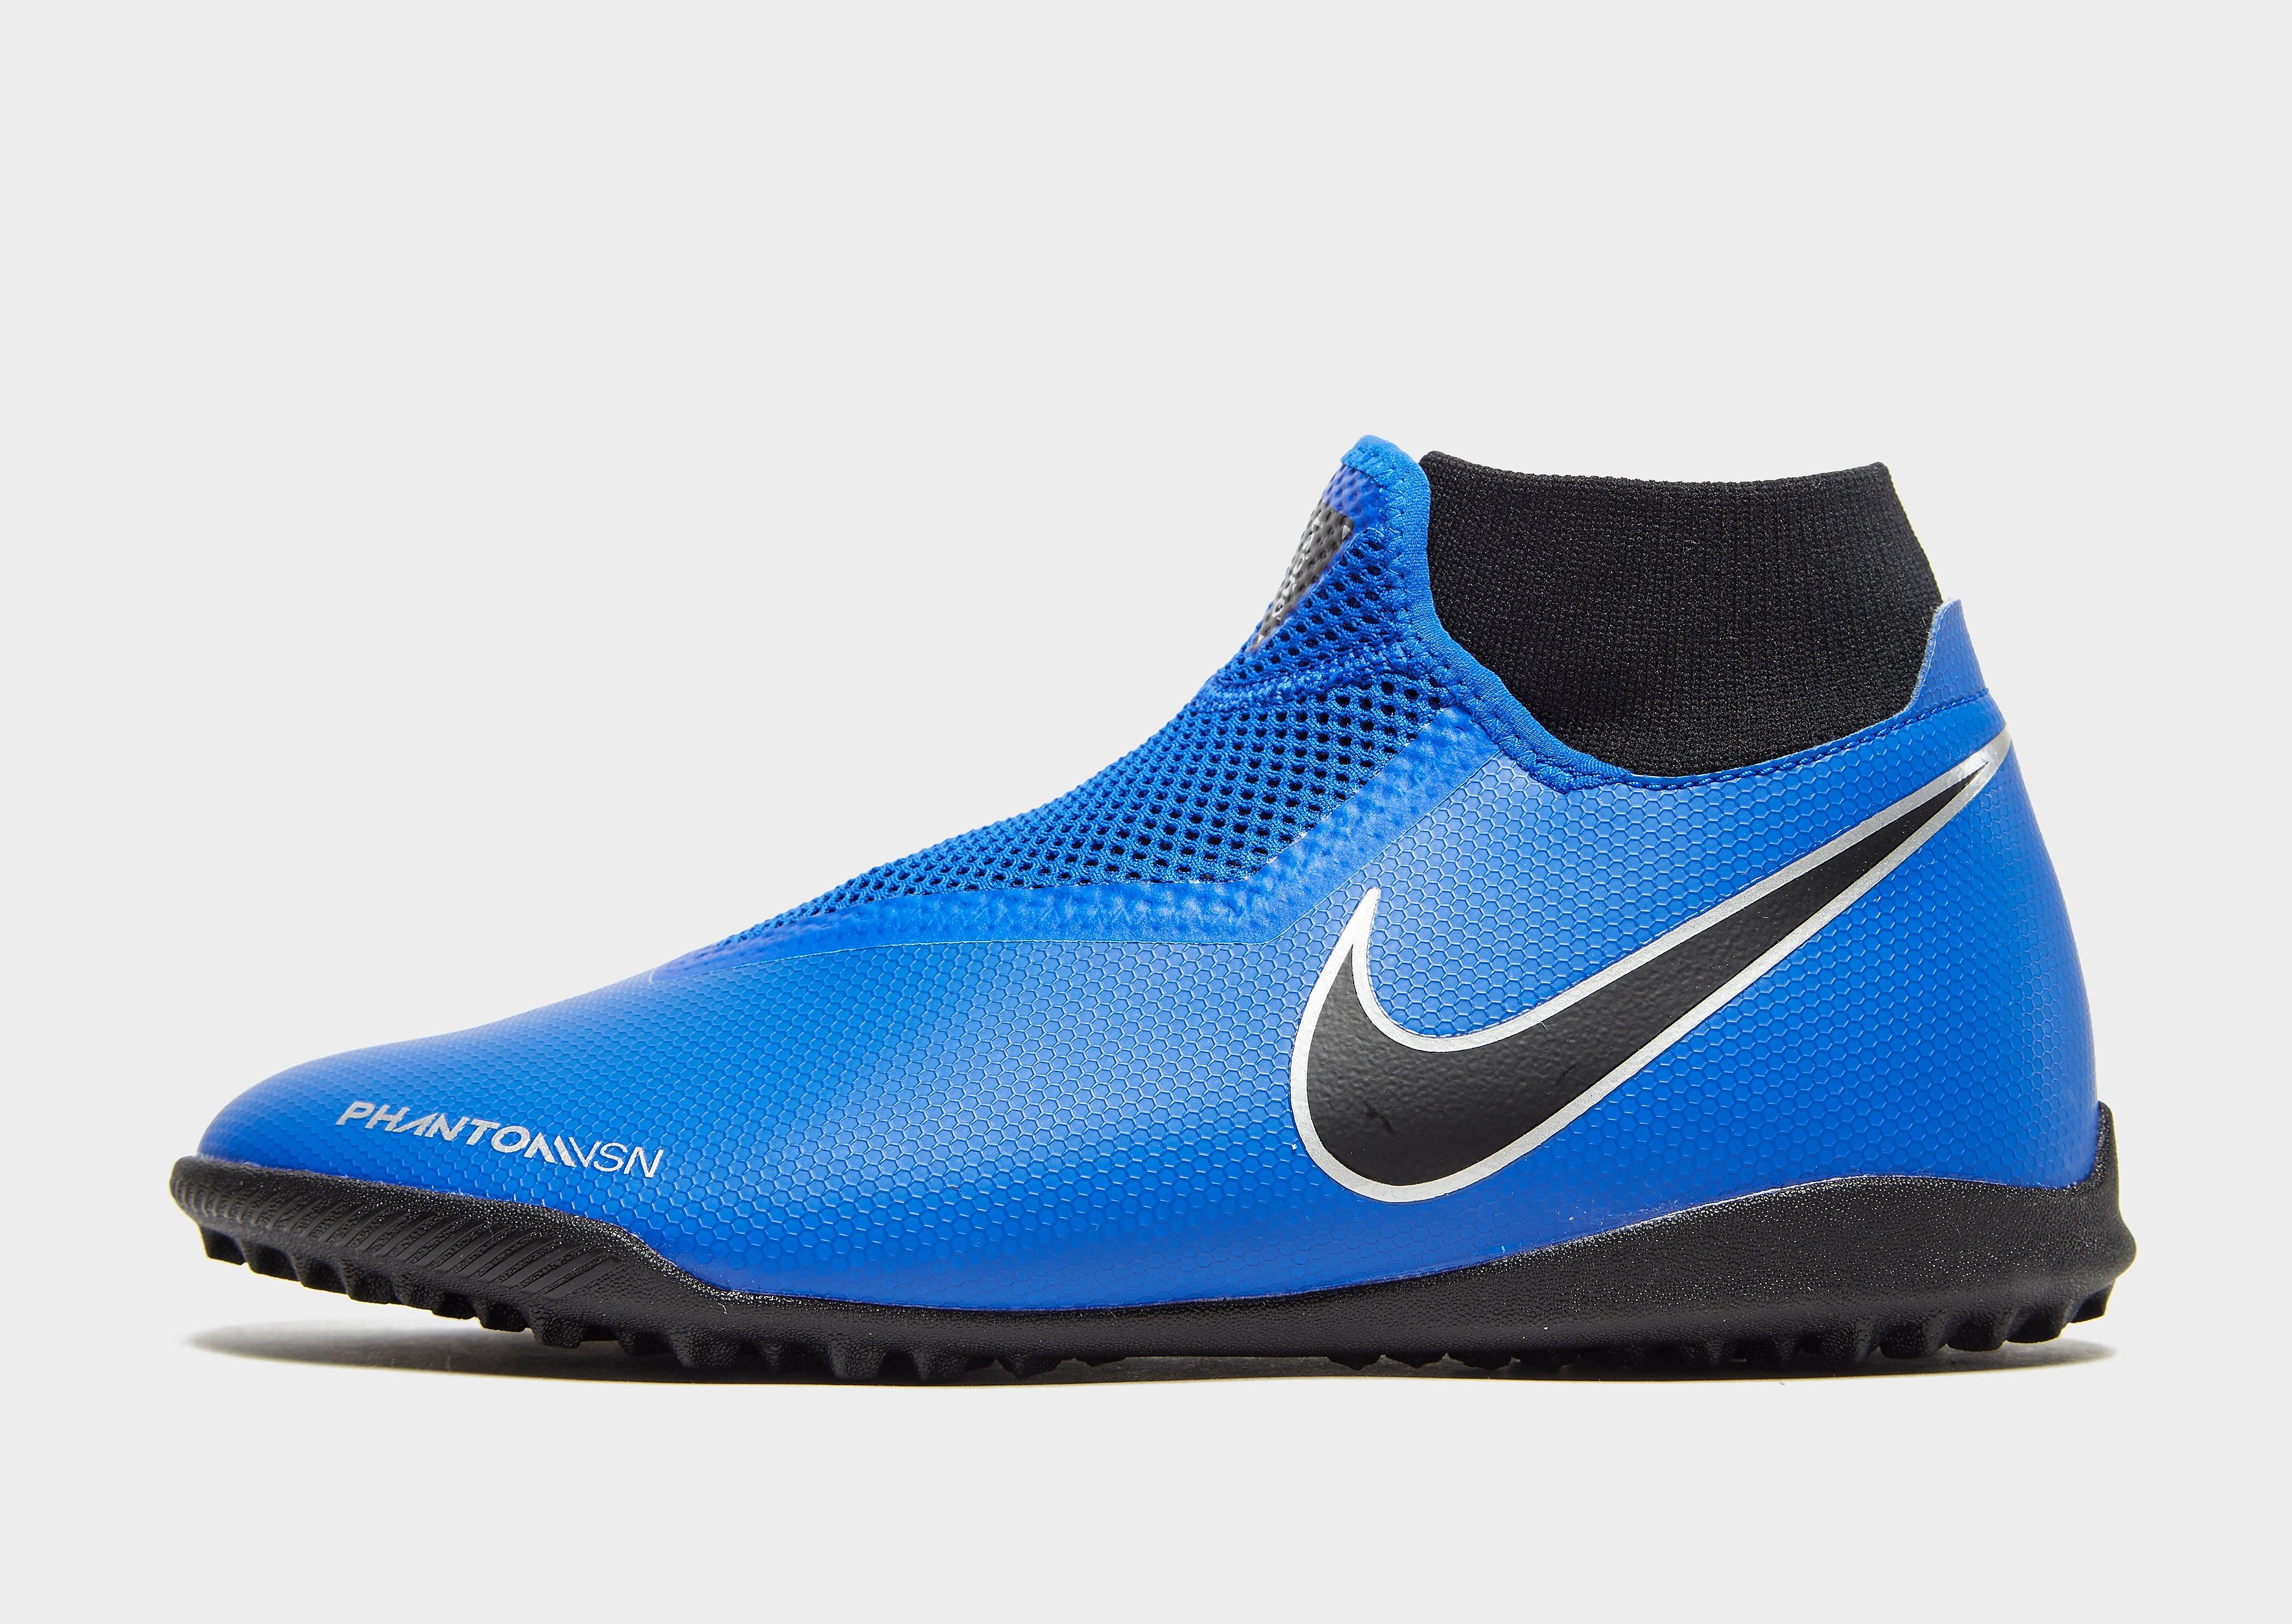 Nike Always Forward Phantom VSN Academy Dynamic Fit TF Heren - Blauw - Heren